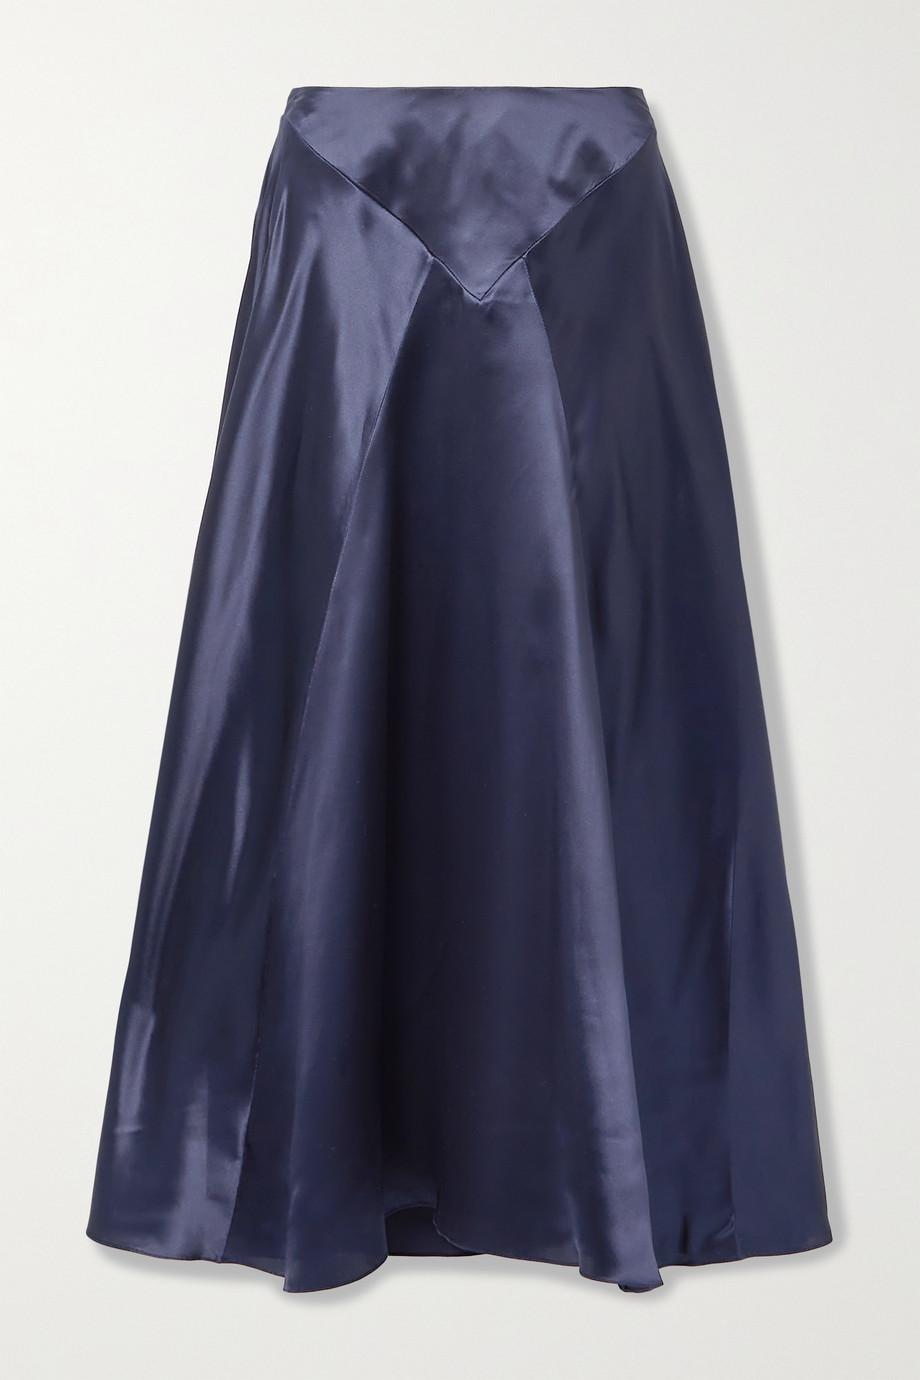 Simone Rocha Silk-satin maxi skirt